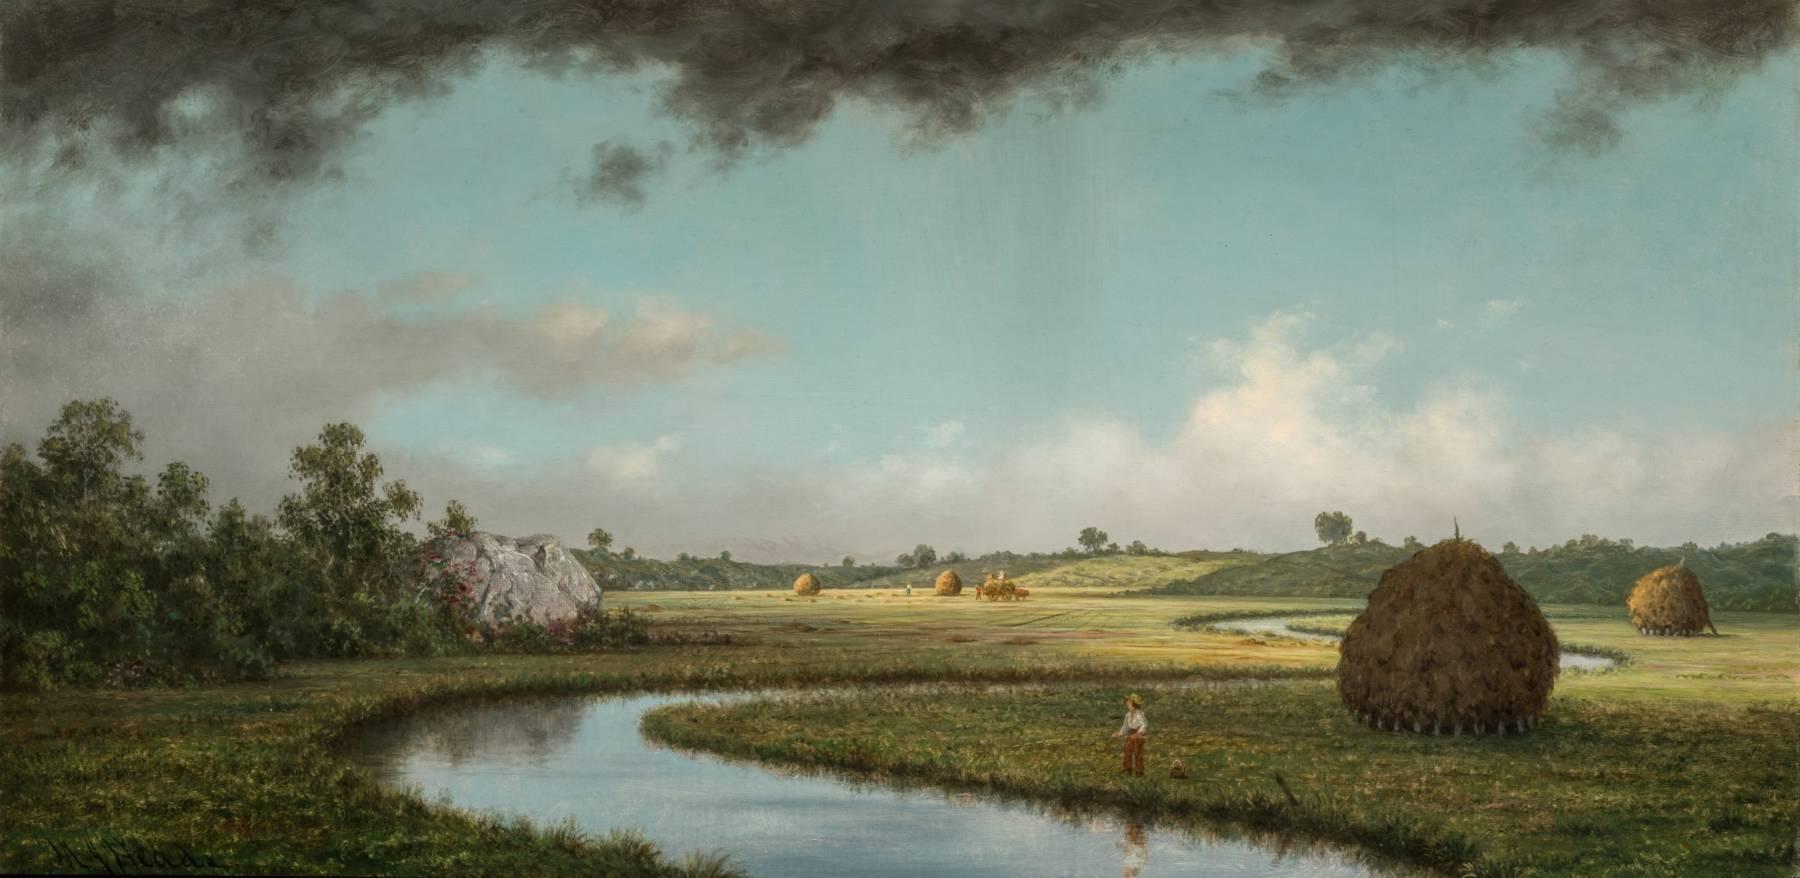 Martin Johnson Heade, Le Marais de Newburyport : l'approche de l'orage